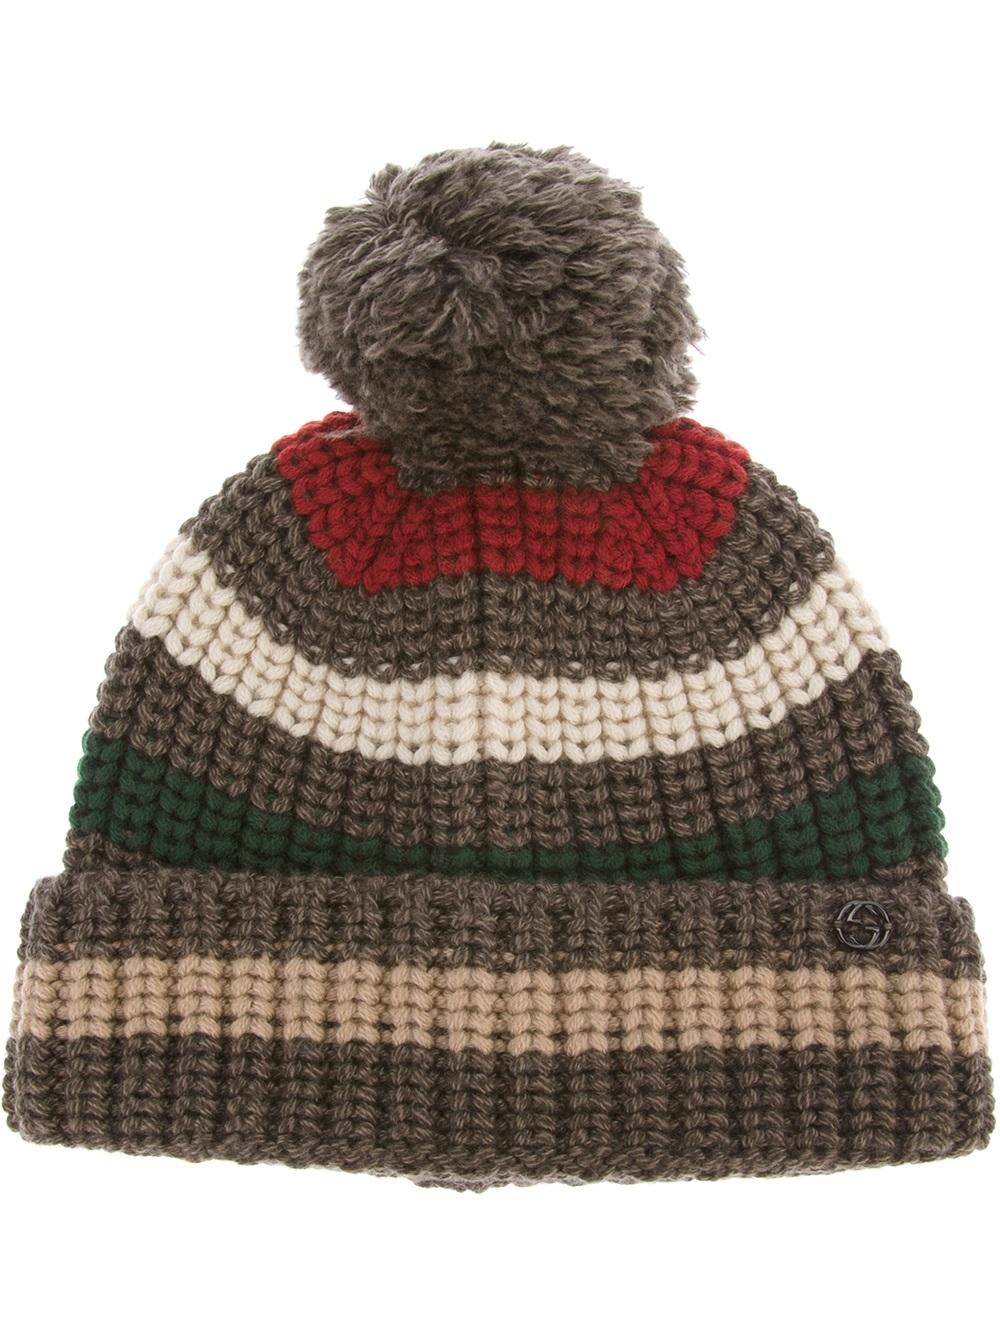 Lyst - Gucci Beanie Hat in Brown for Men 4ec8ea78144